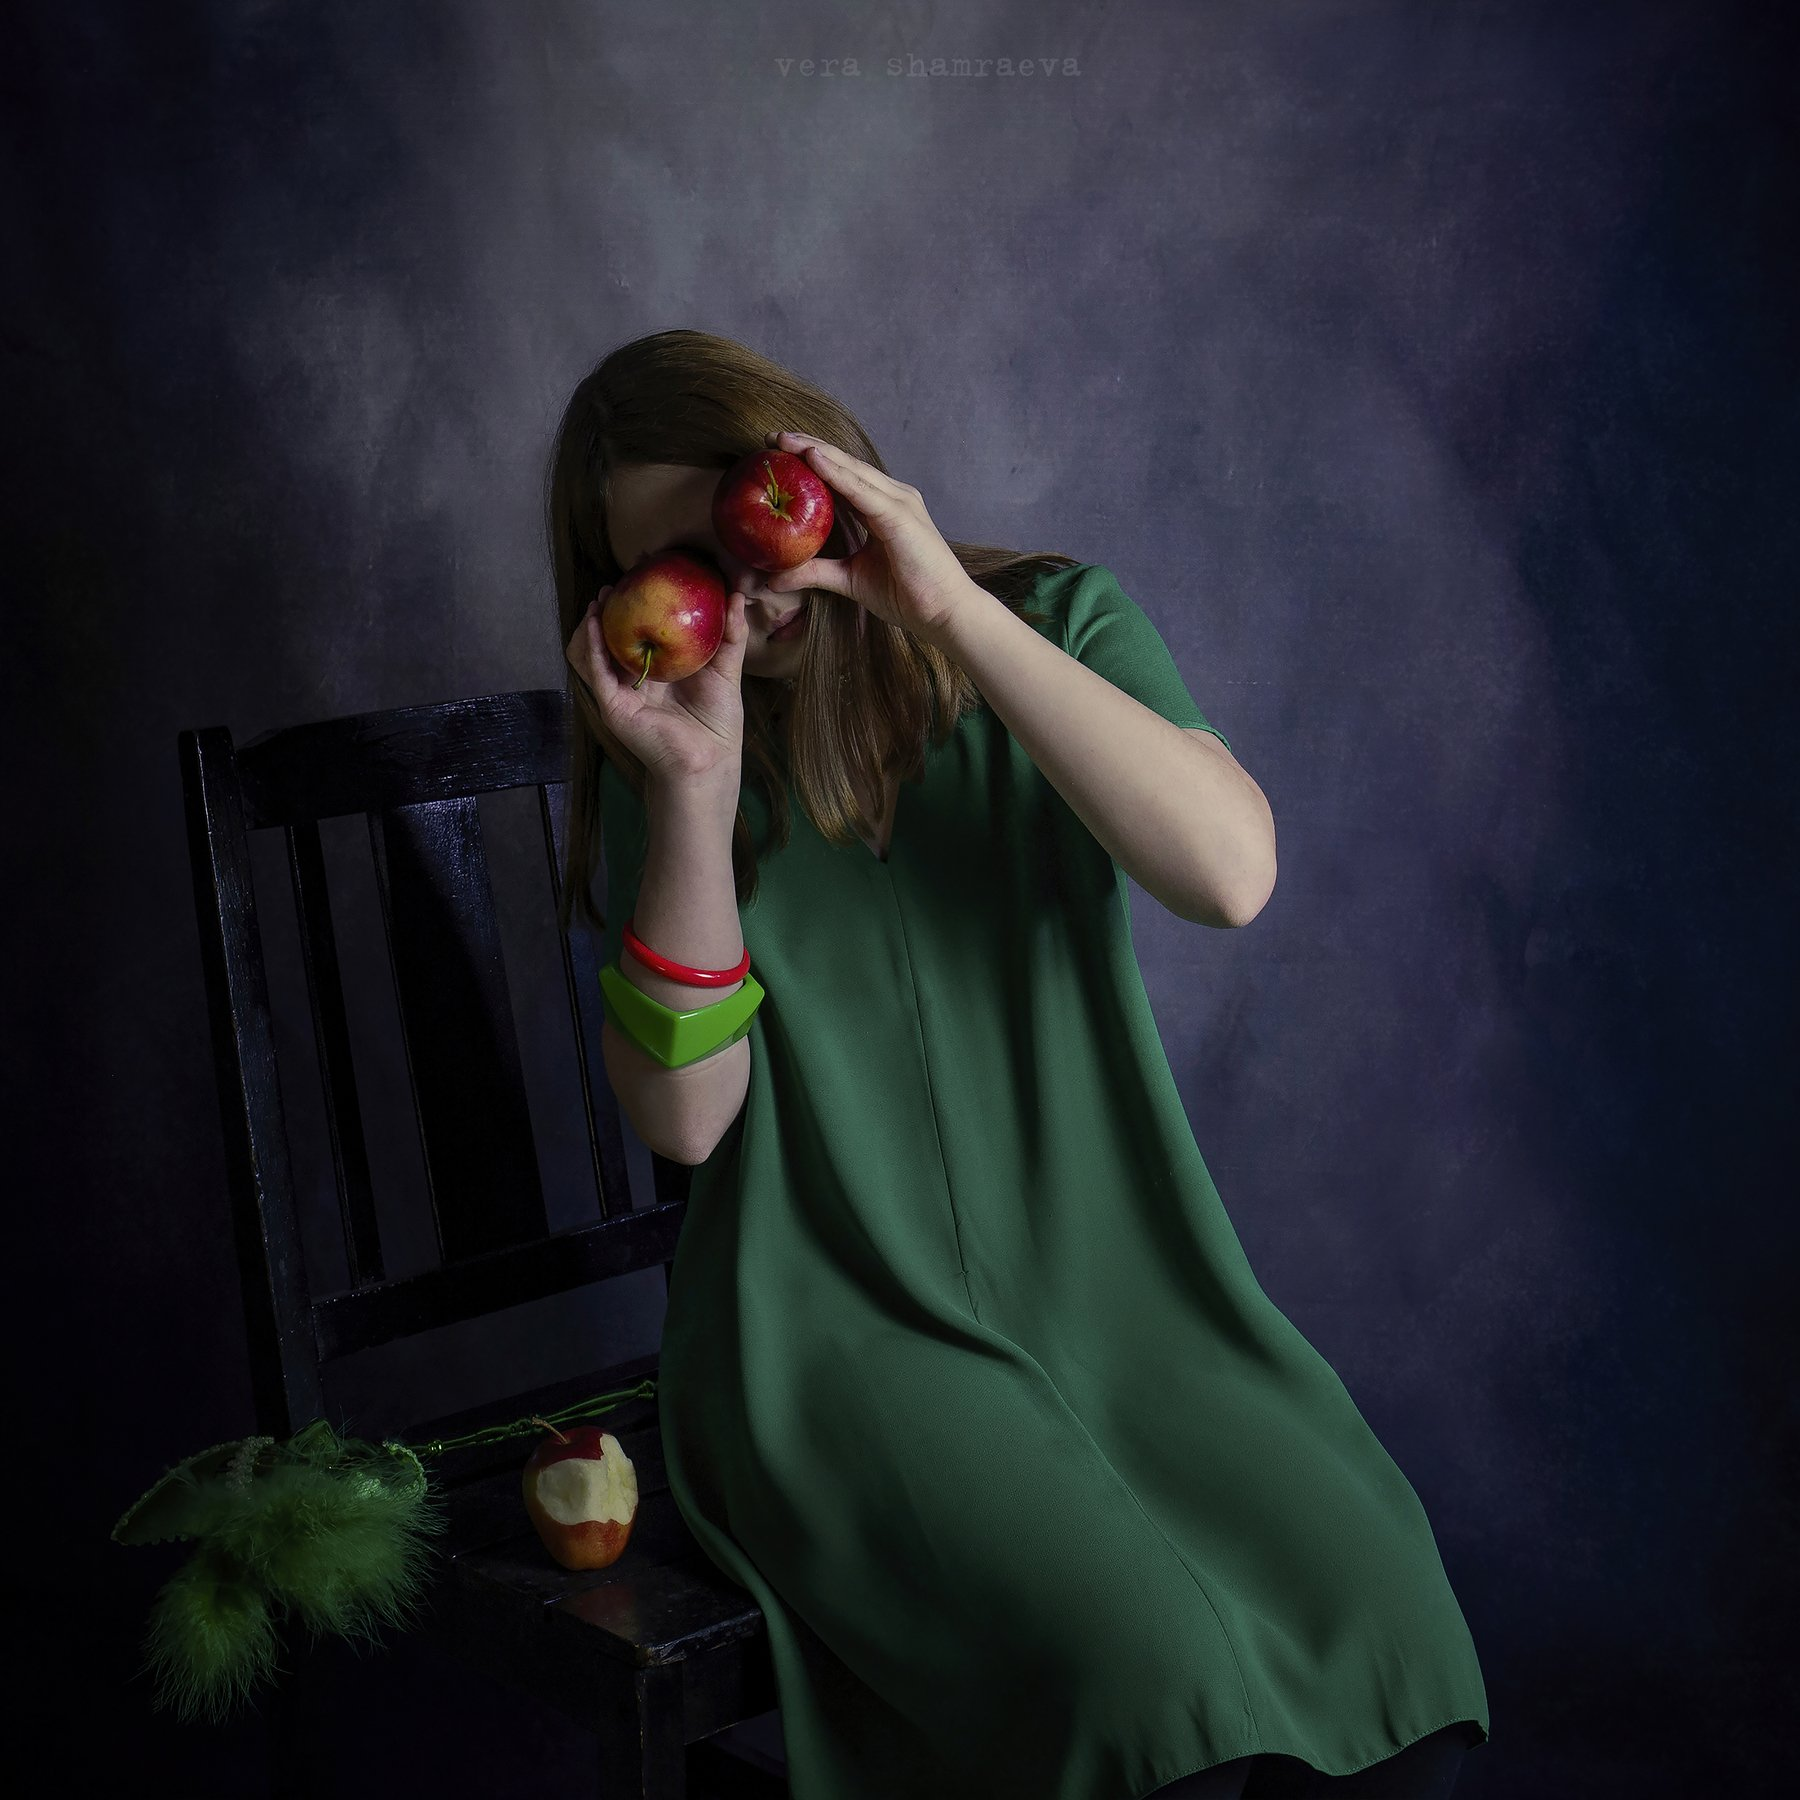 яблоки девочка вера шамраева постановка, Вера Шамраева